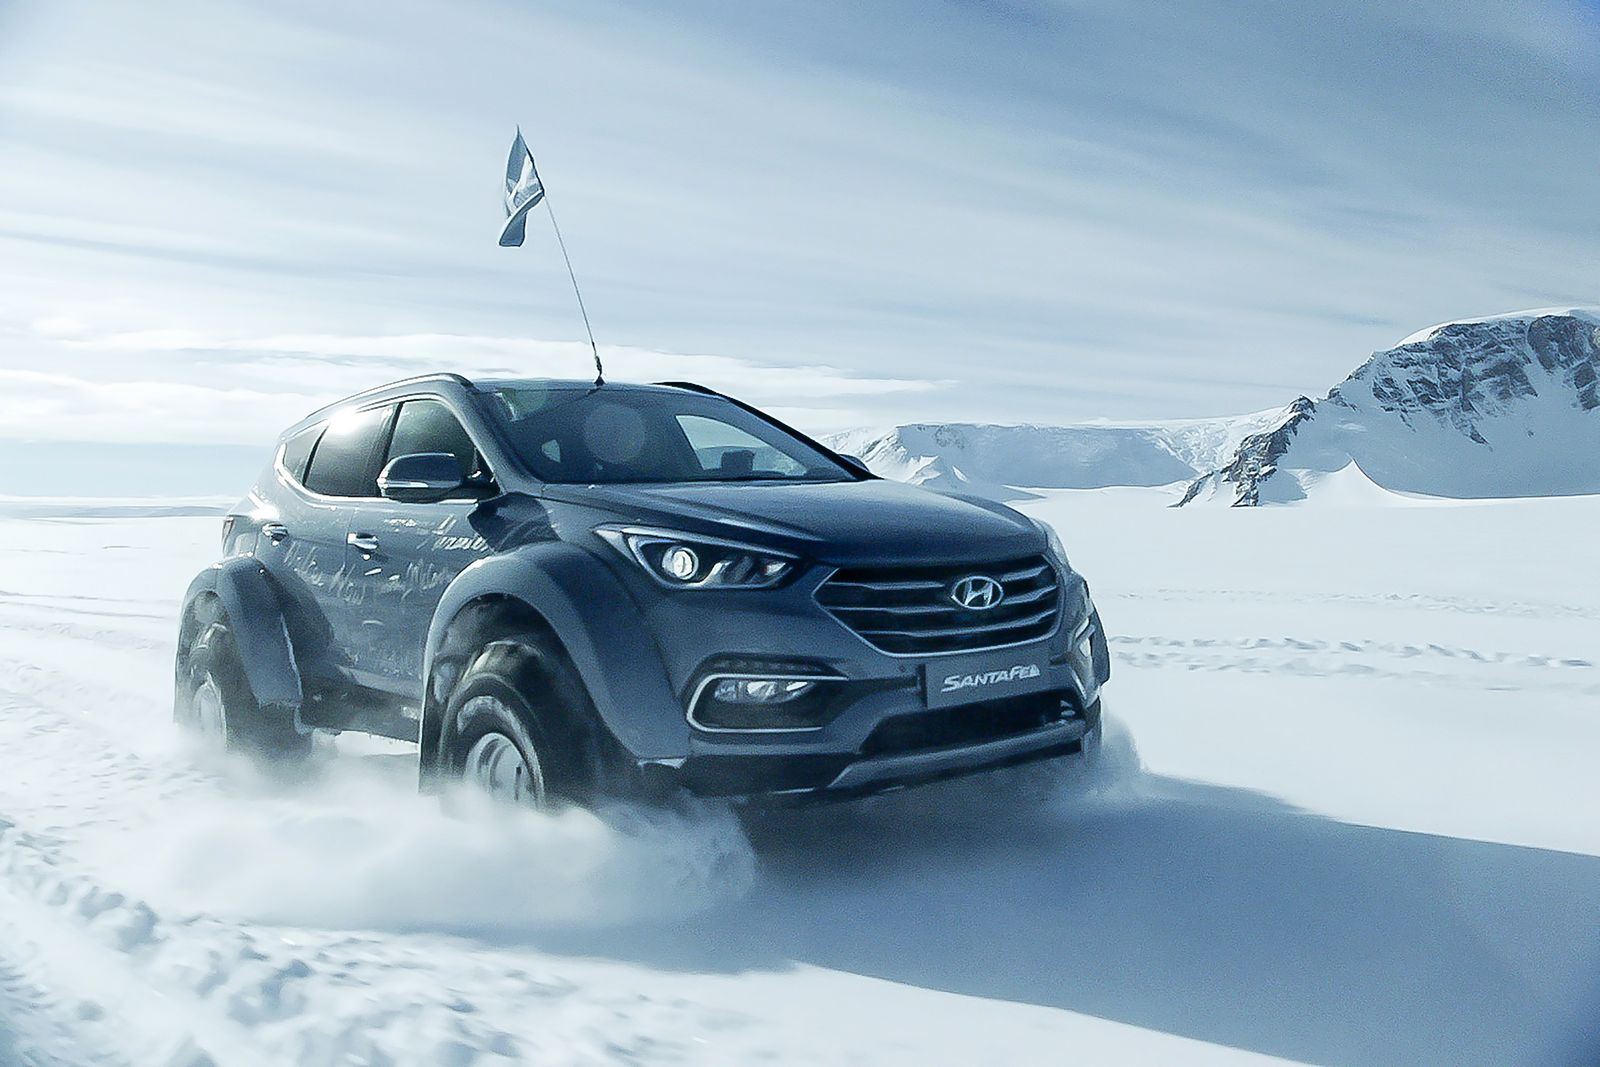 Hyundai Sante Fe Antarctic (5)